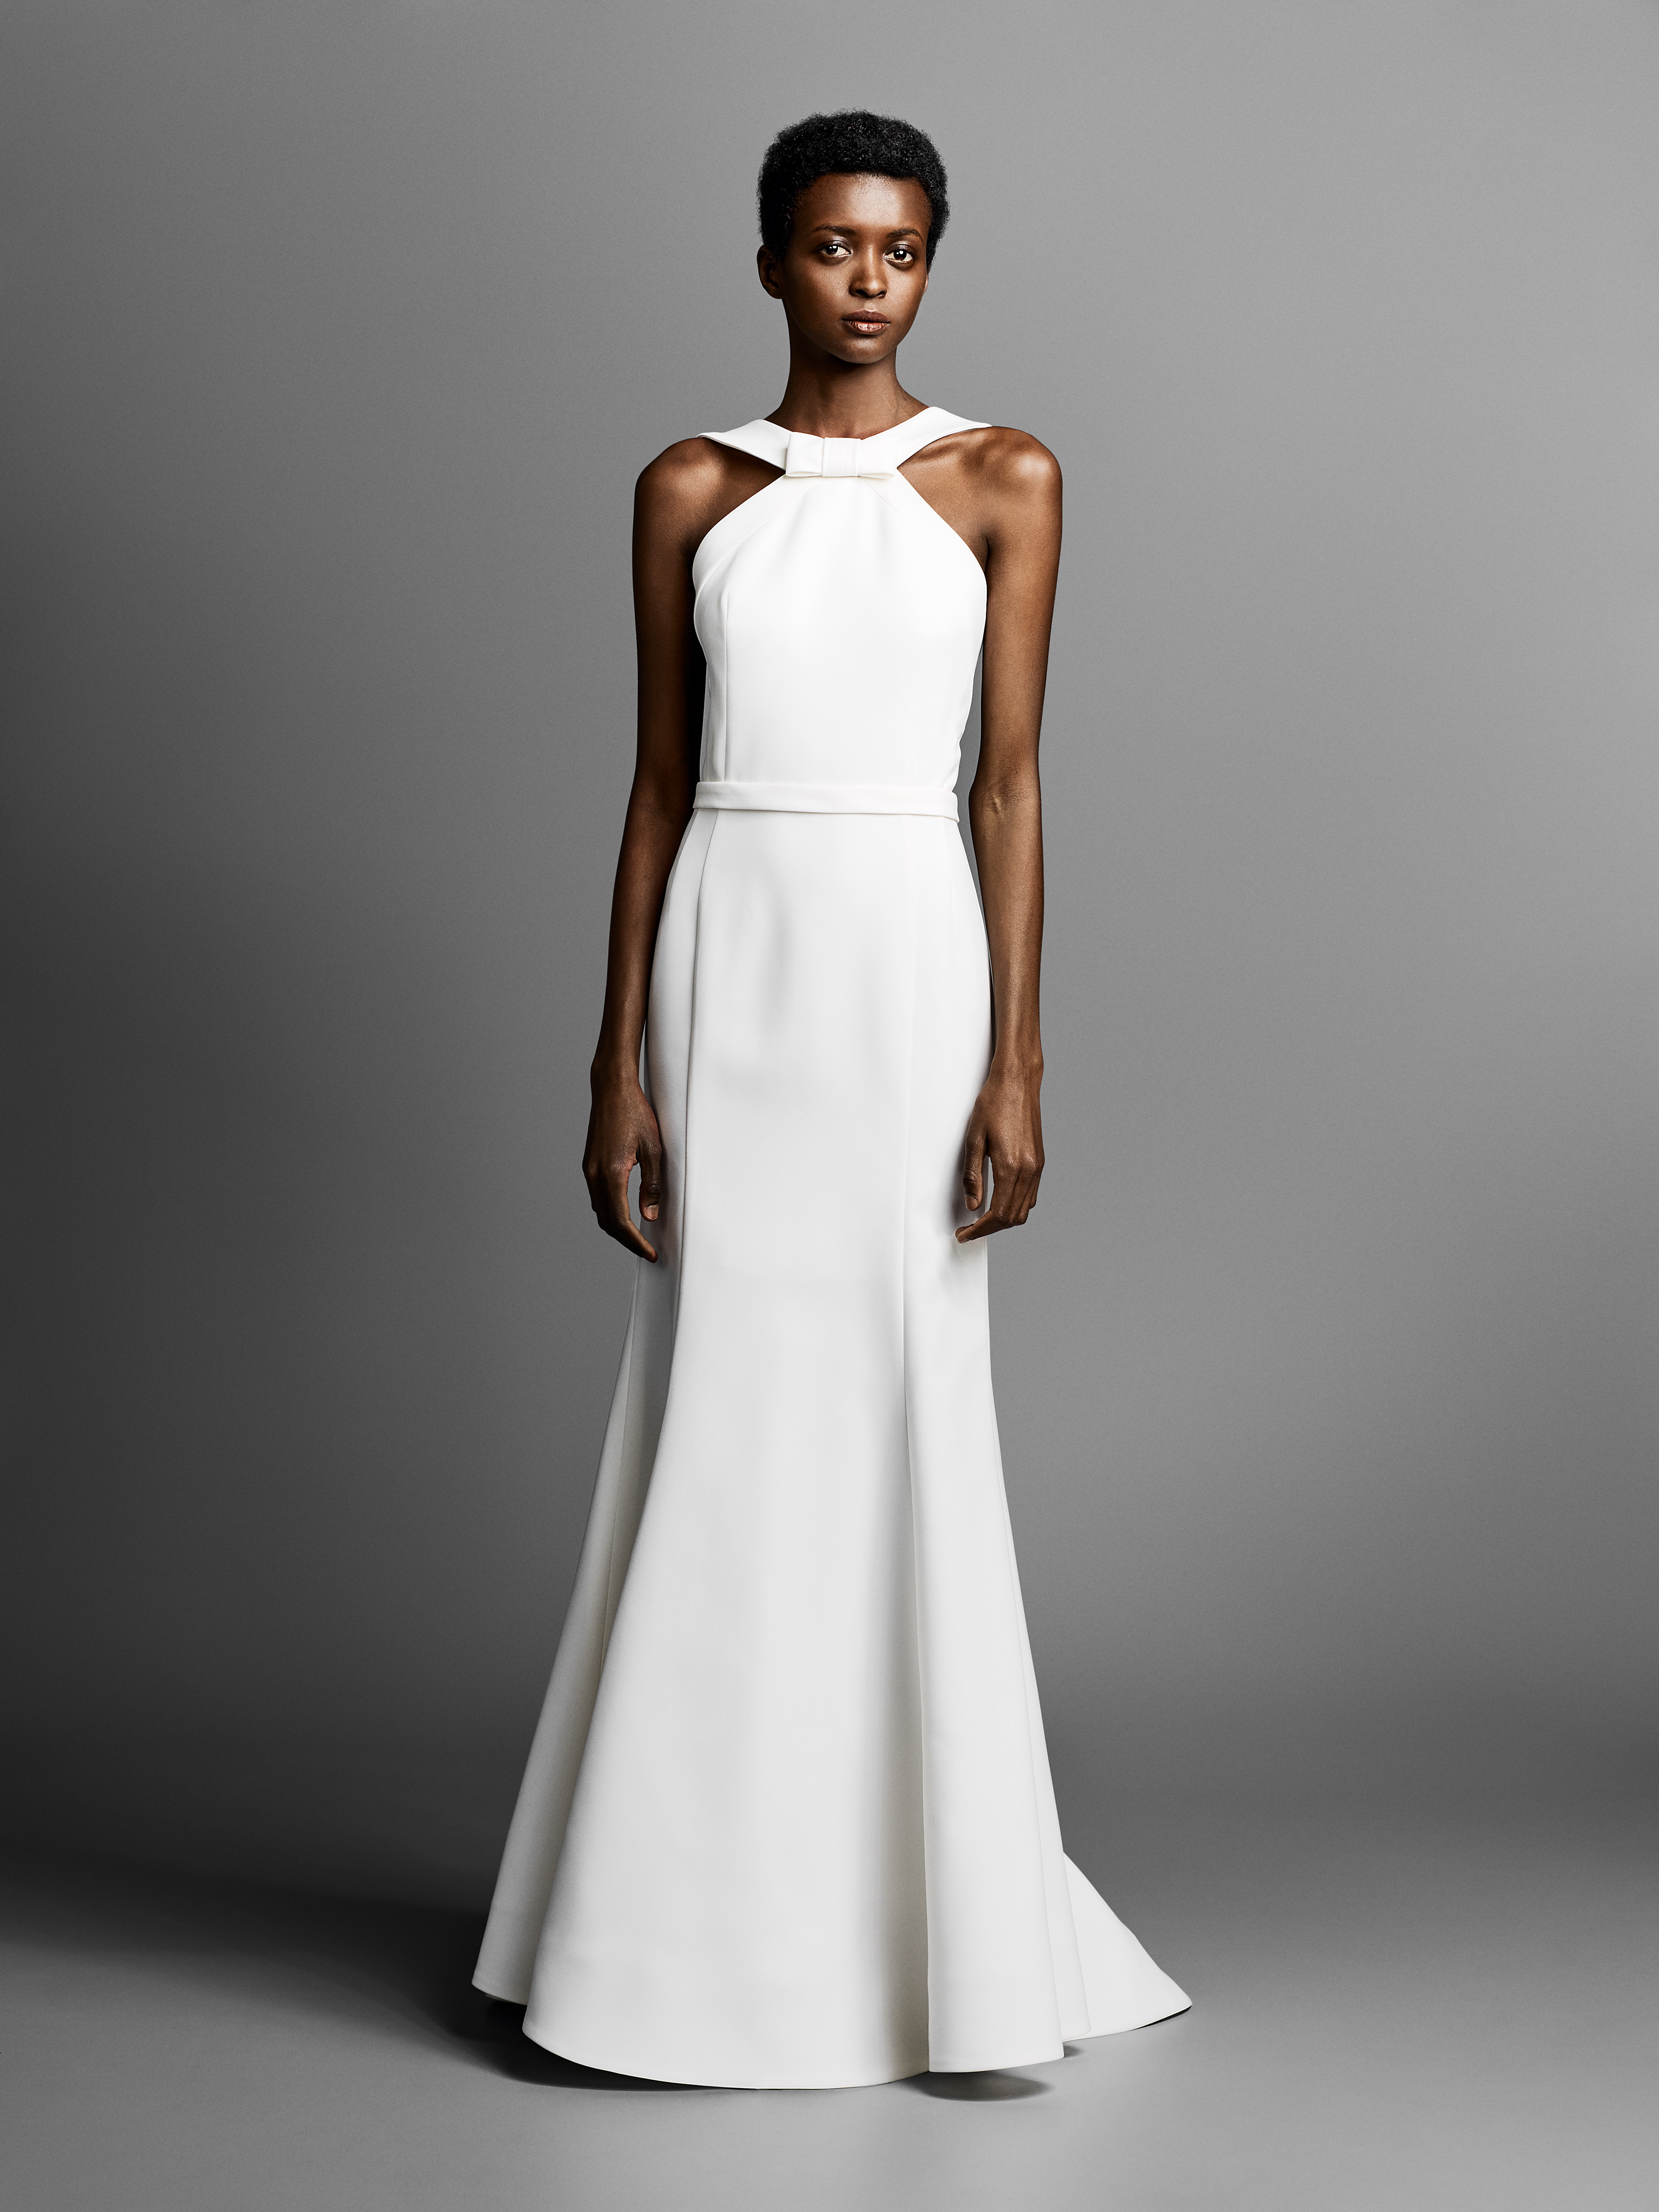 viktor rolf wedding dress with halter neckline spring 2019